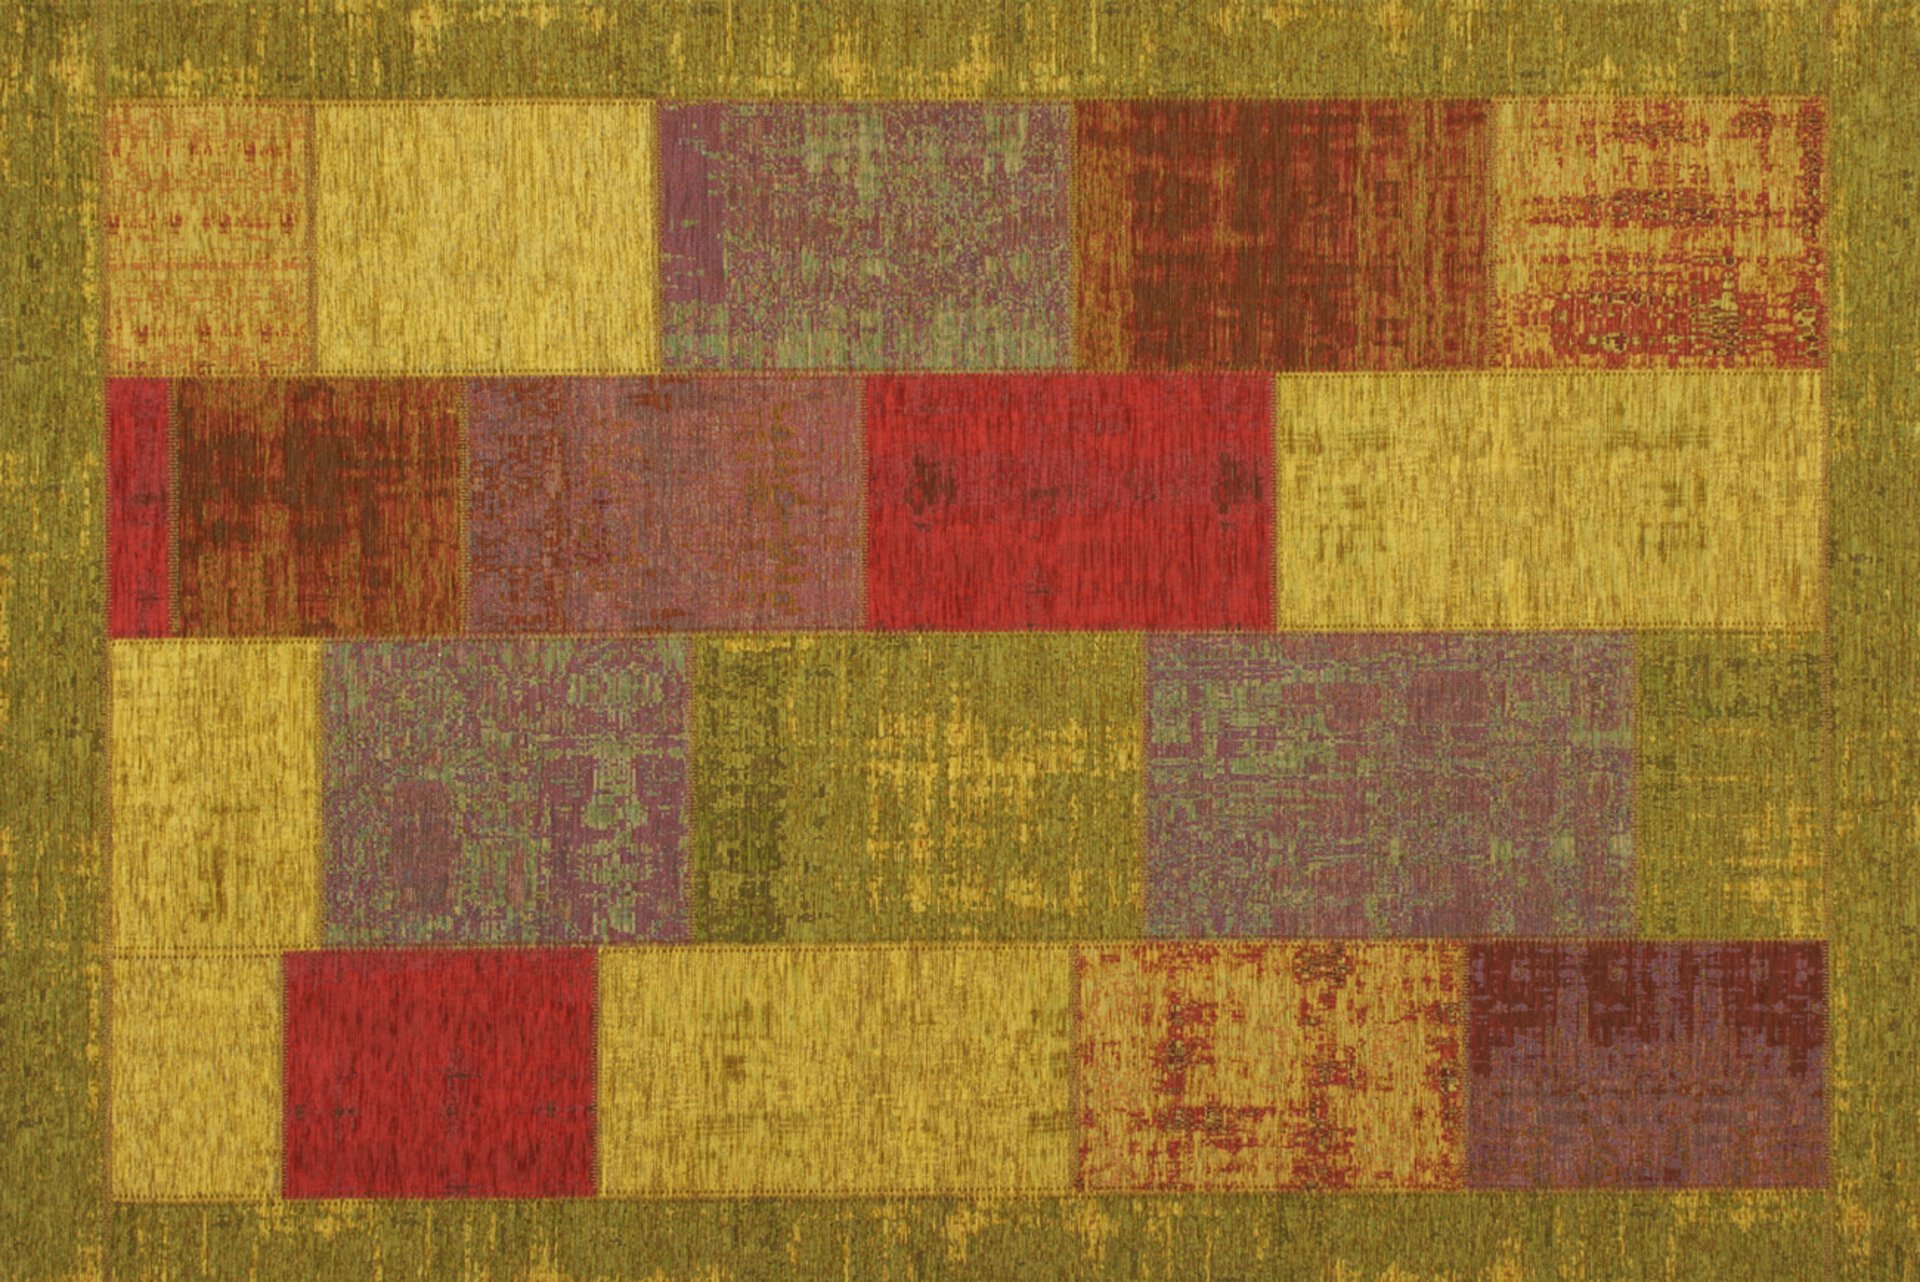 Maschinenwebteppich Delicate Karpi Textil mehrfarbig 155 x 230 cm